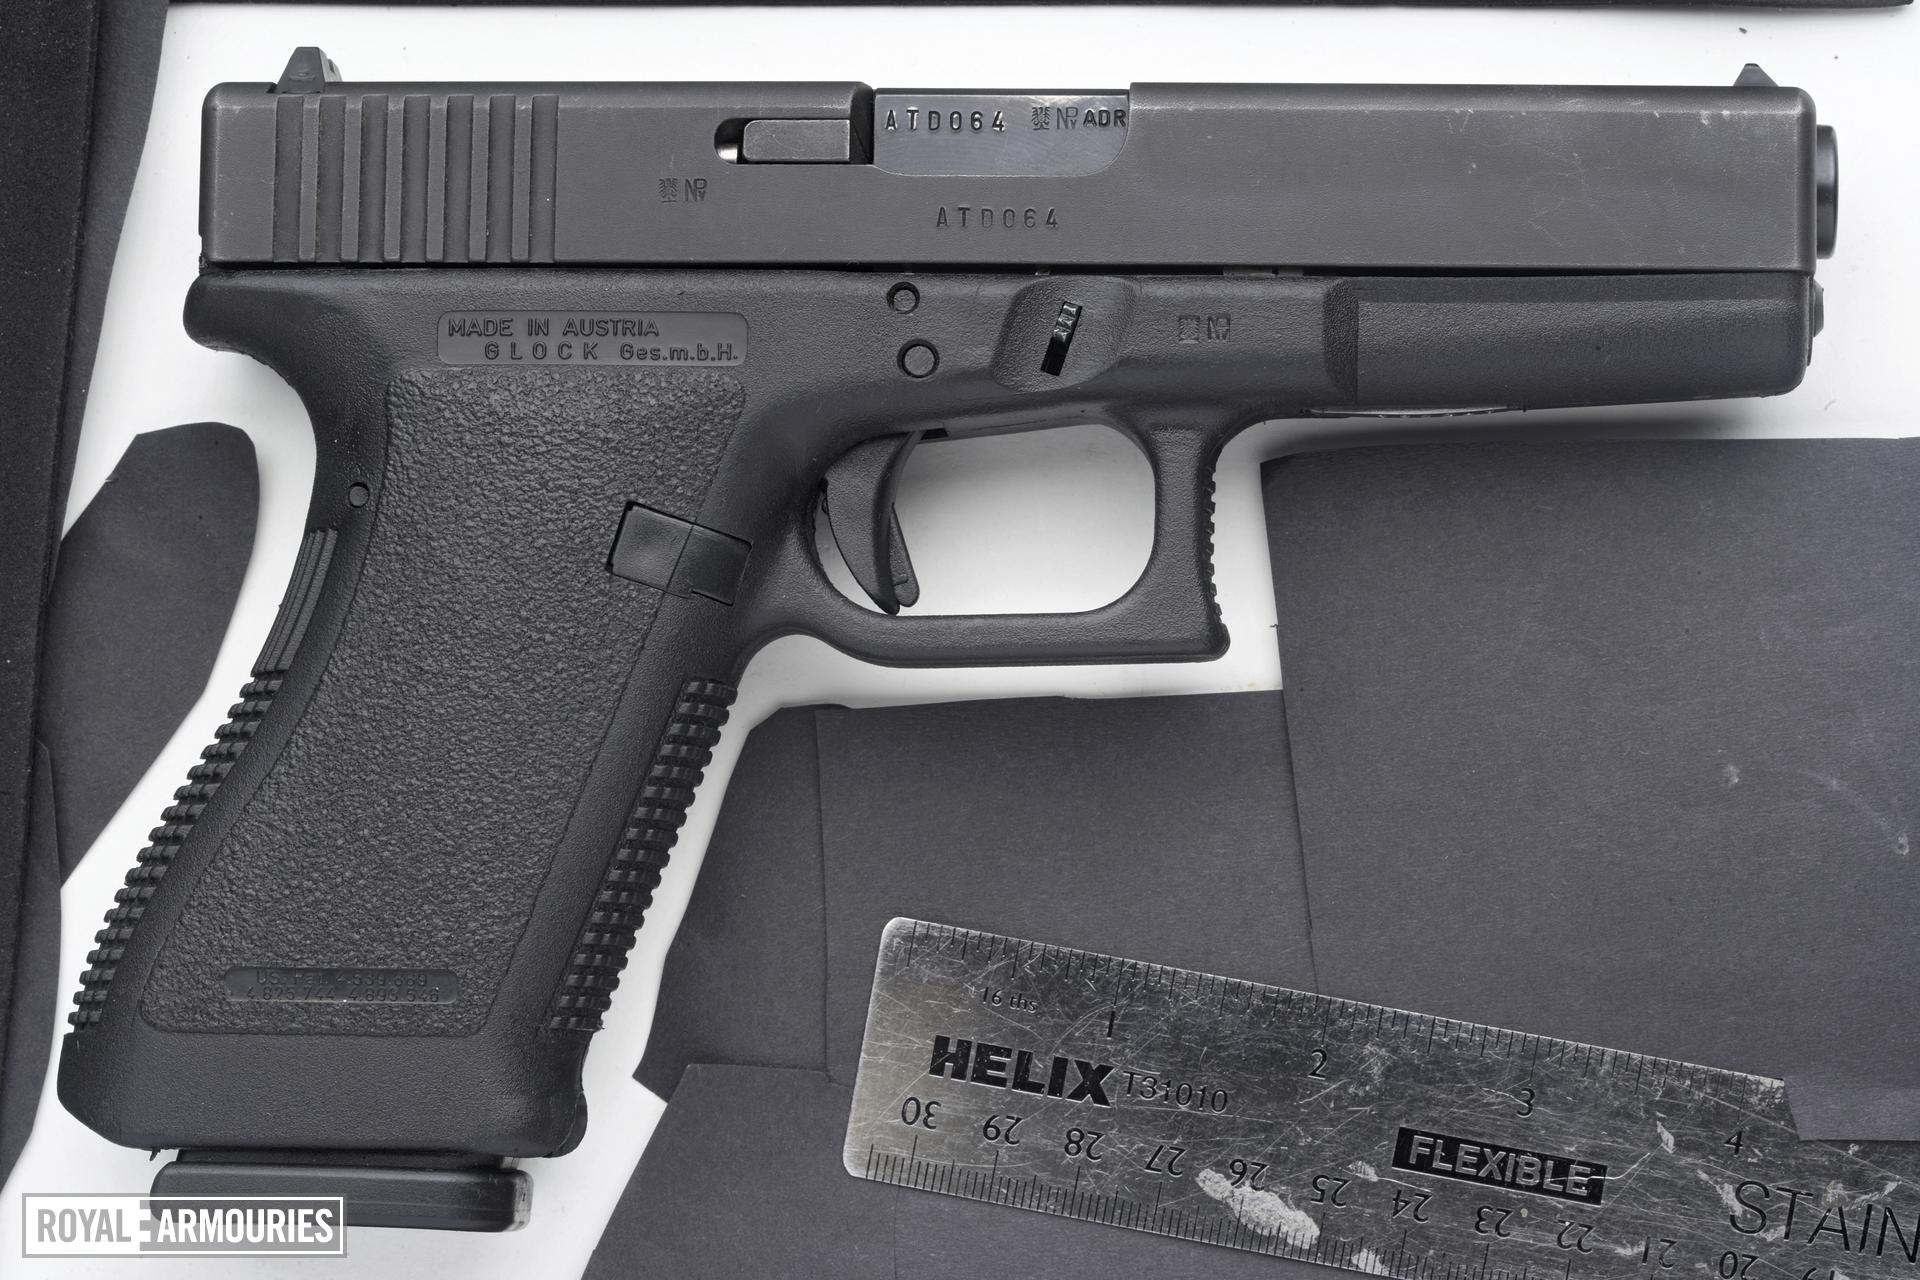 Centrefire self-loading pistol - Glock 21 Generation 2